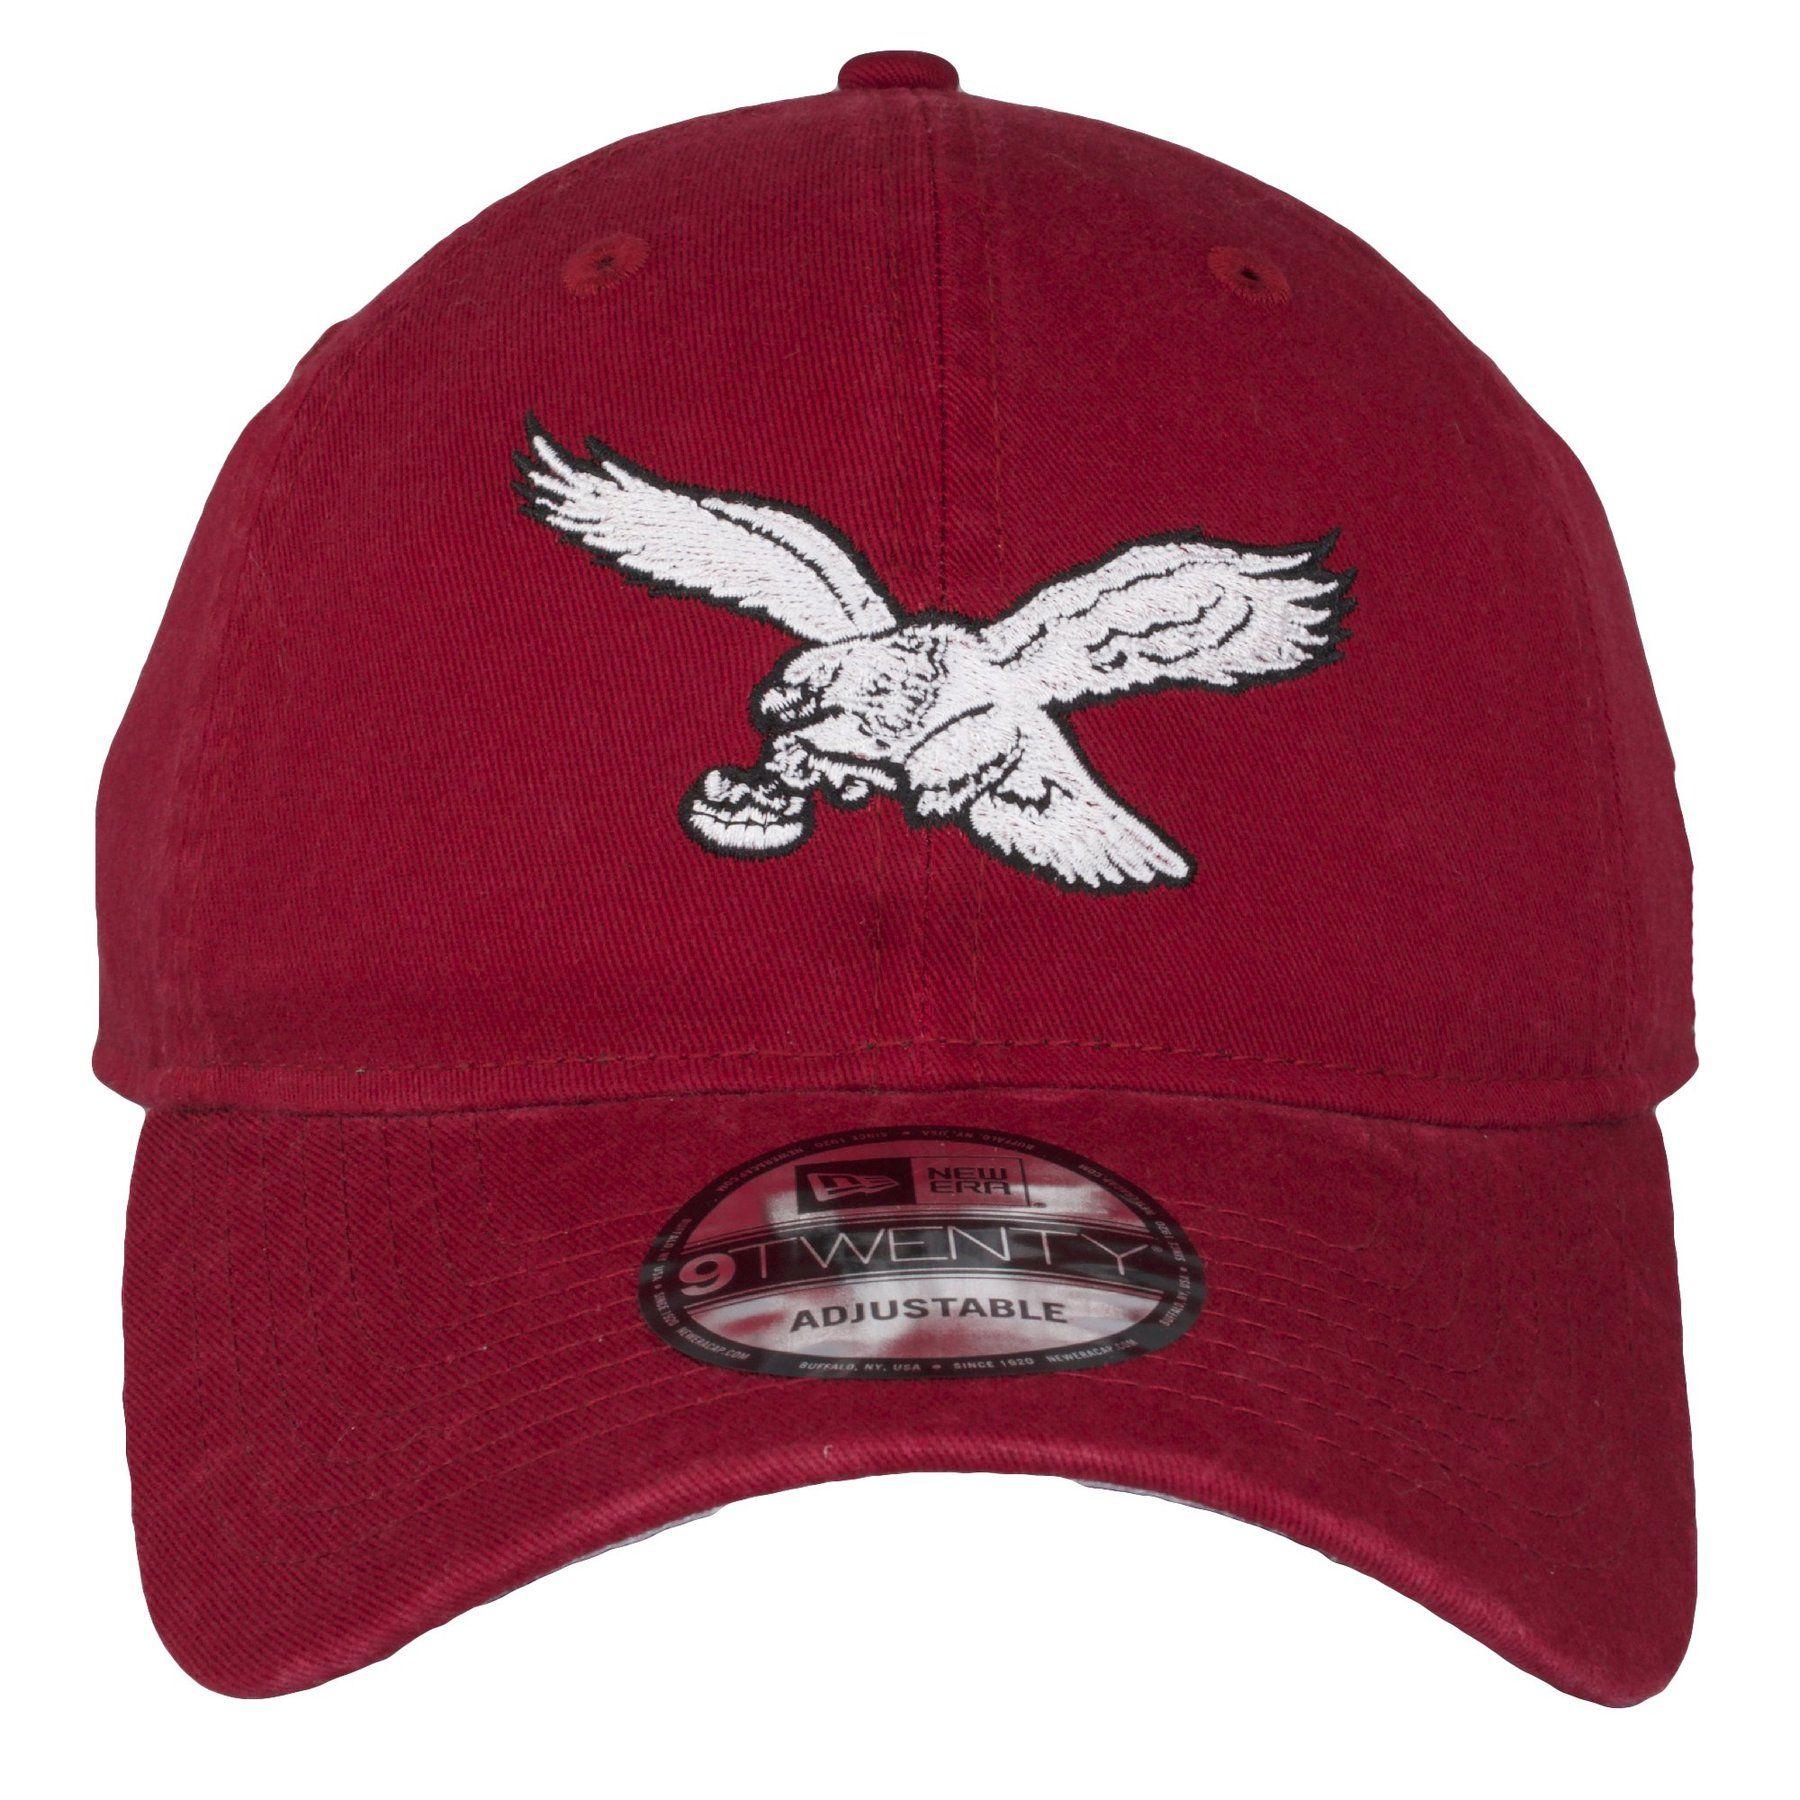 30f7f0e3 Shop our new line up of vintage Philadelphia Eagles dad hats ...